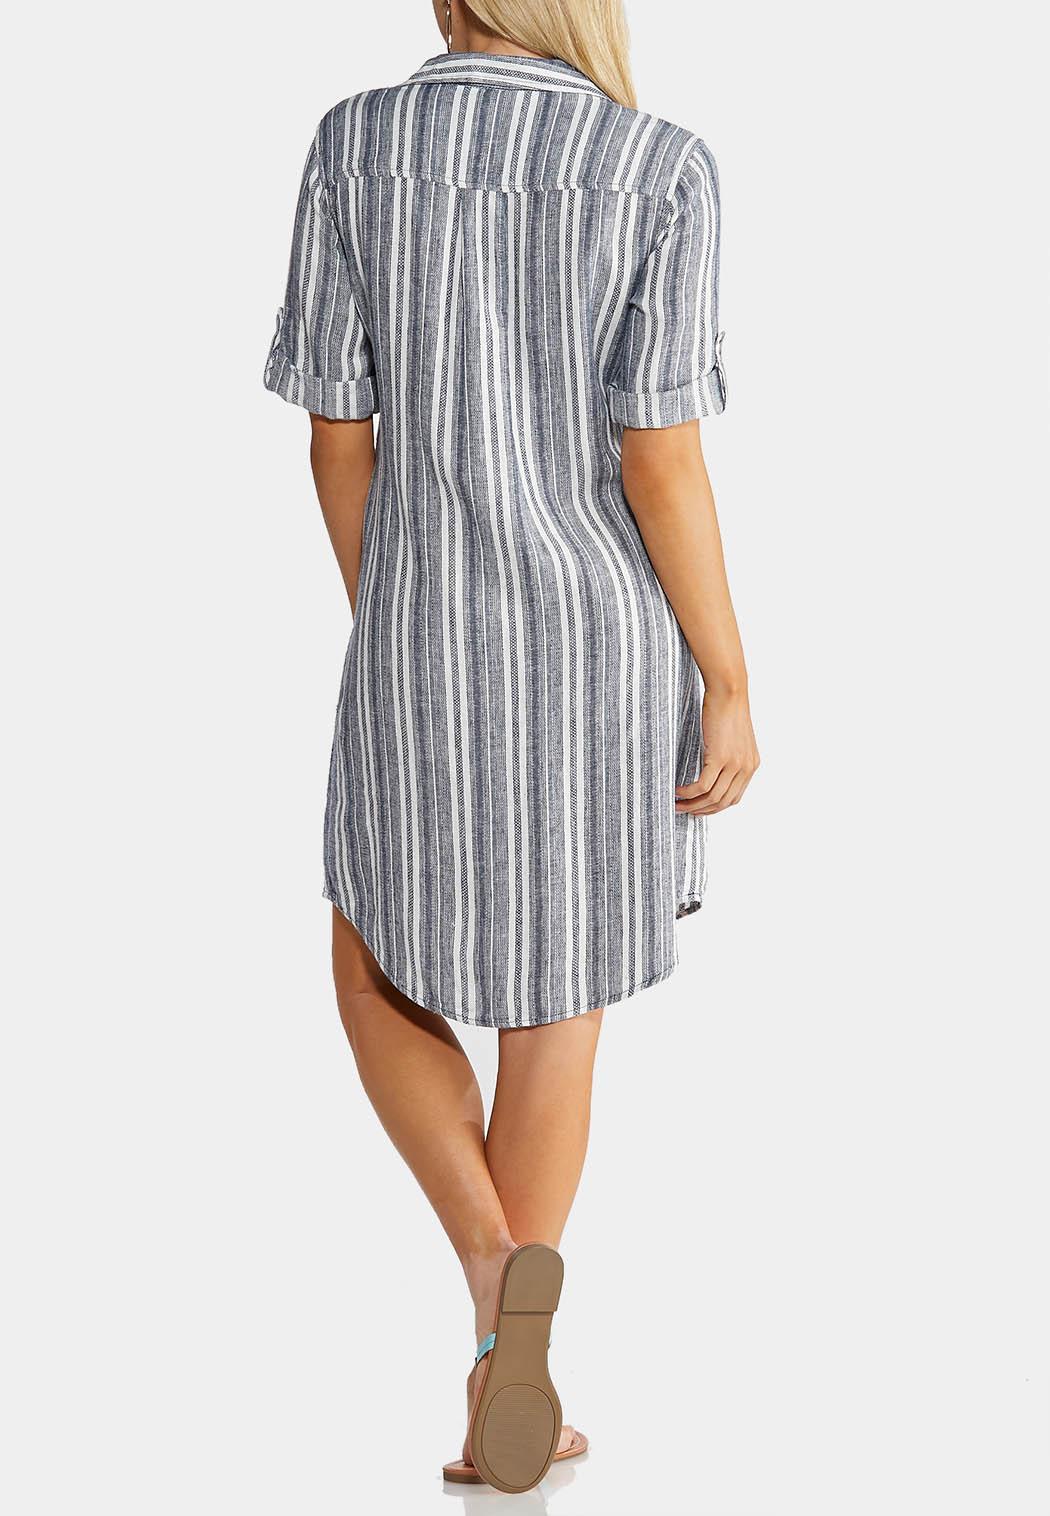 Plus Size Linen Striped Shirt Dress  (Item #43860212)